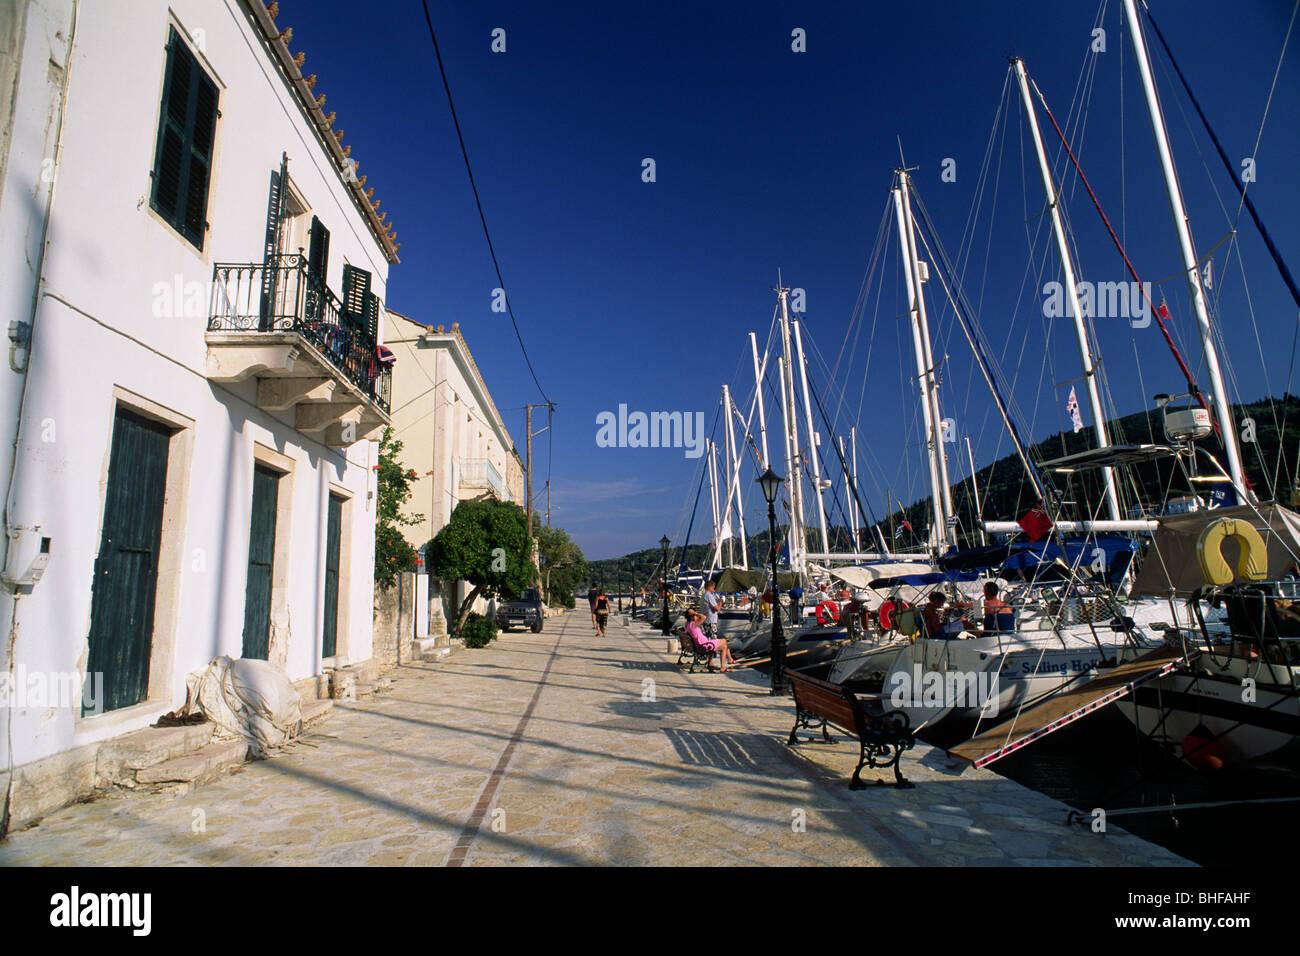 greece, ionian islands, ithaca, kioni port - Stock Image